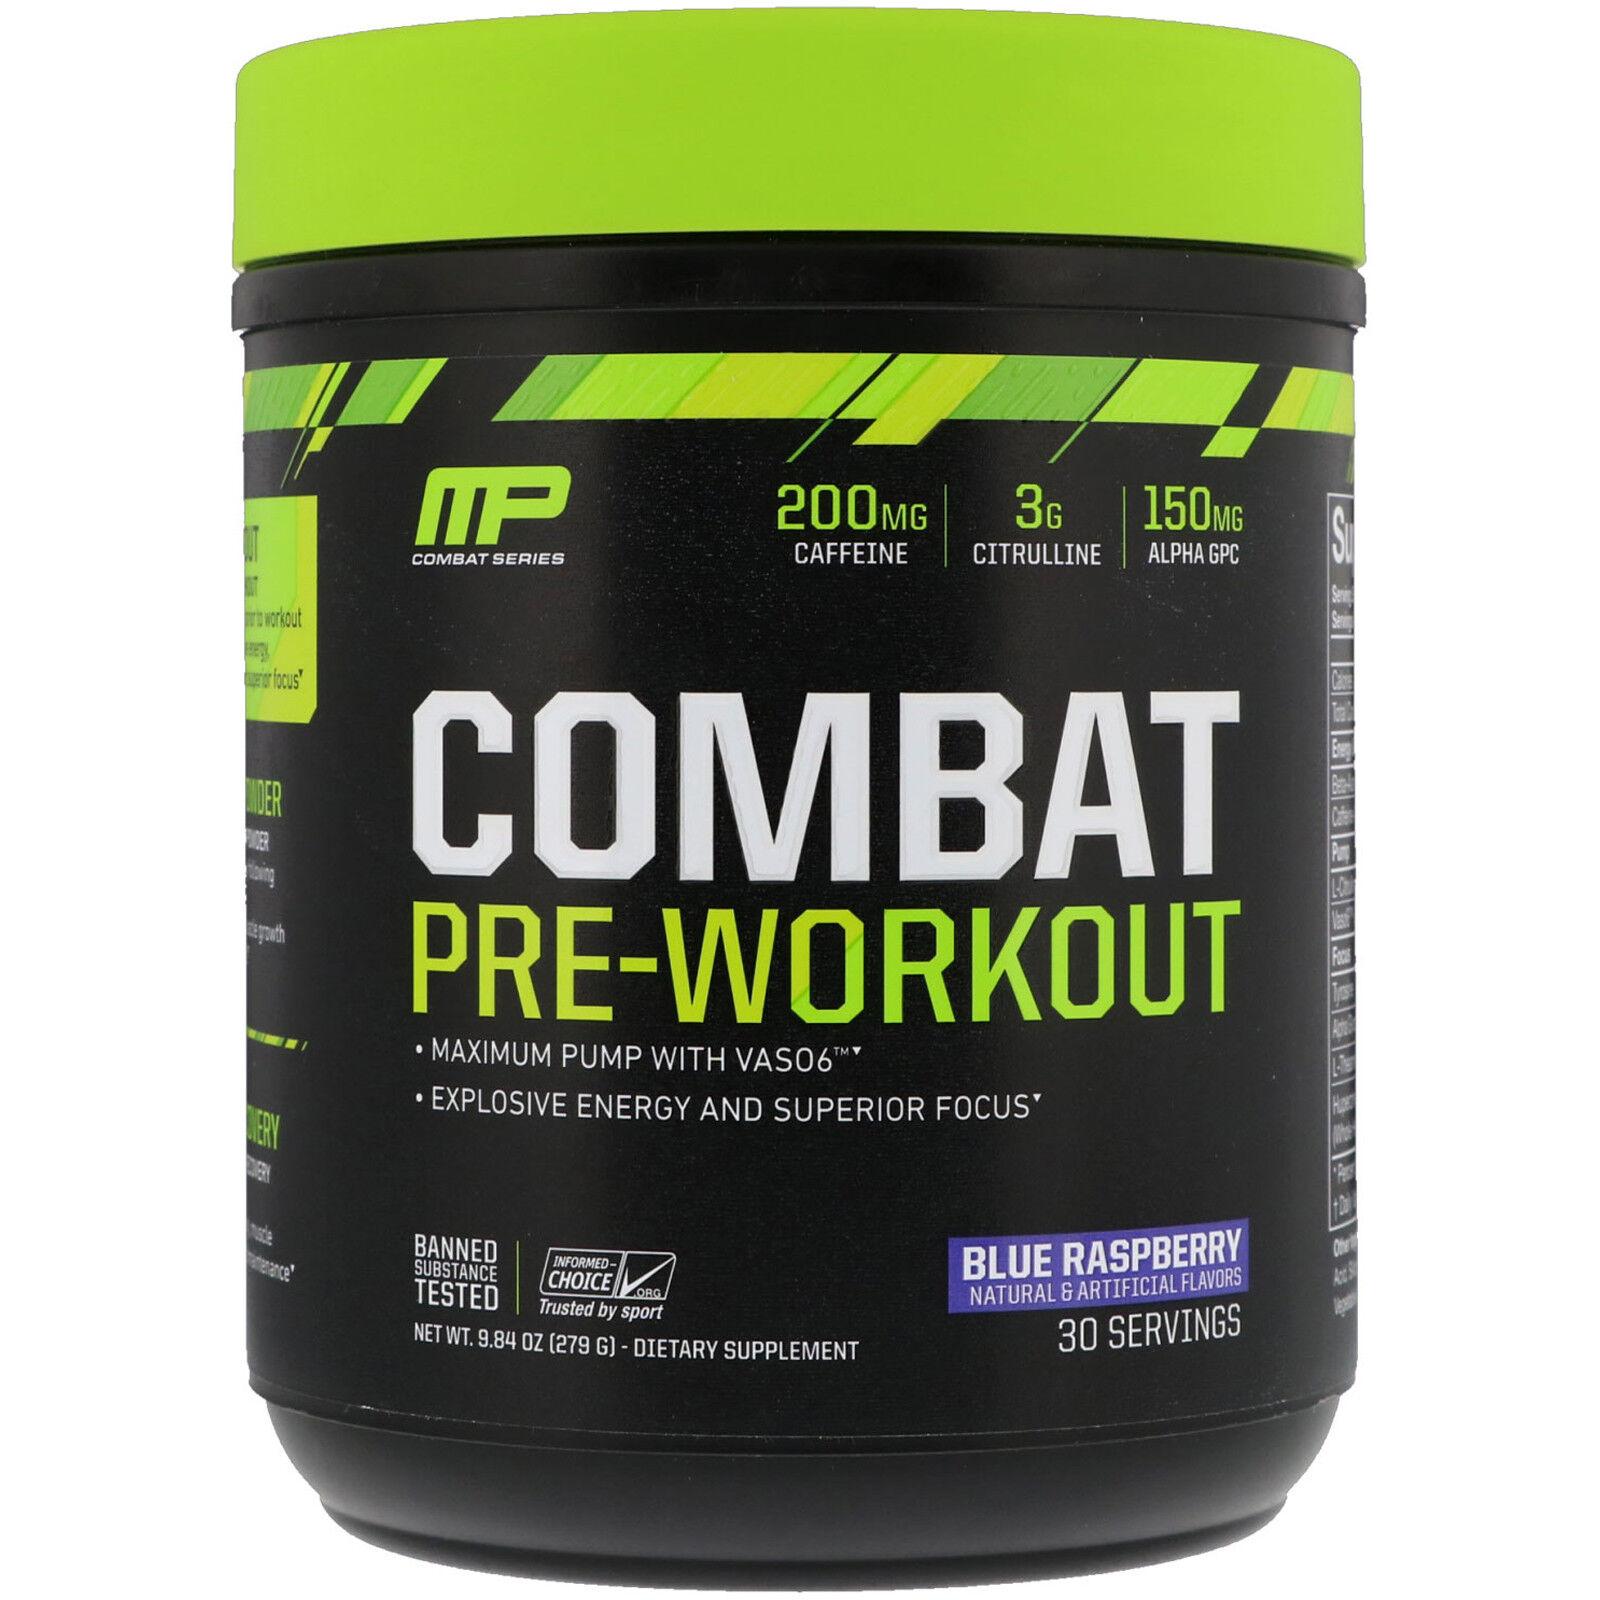 MusclePharm, Combat Pre-Workout, Blau Blau Blau Raspberry, 9.84 oz (279 g) 62e23d